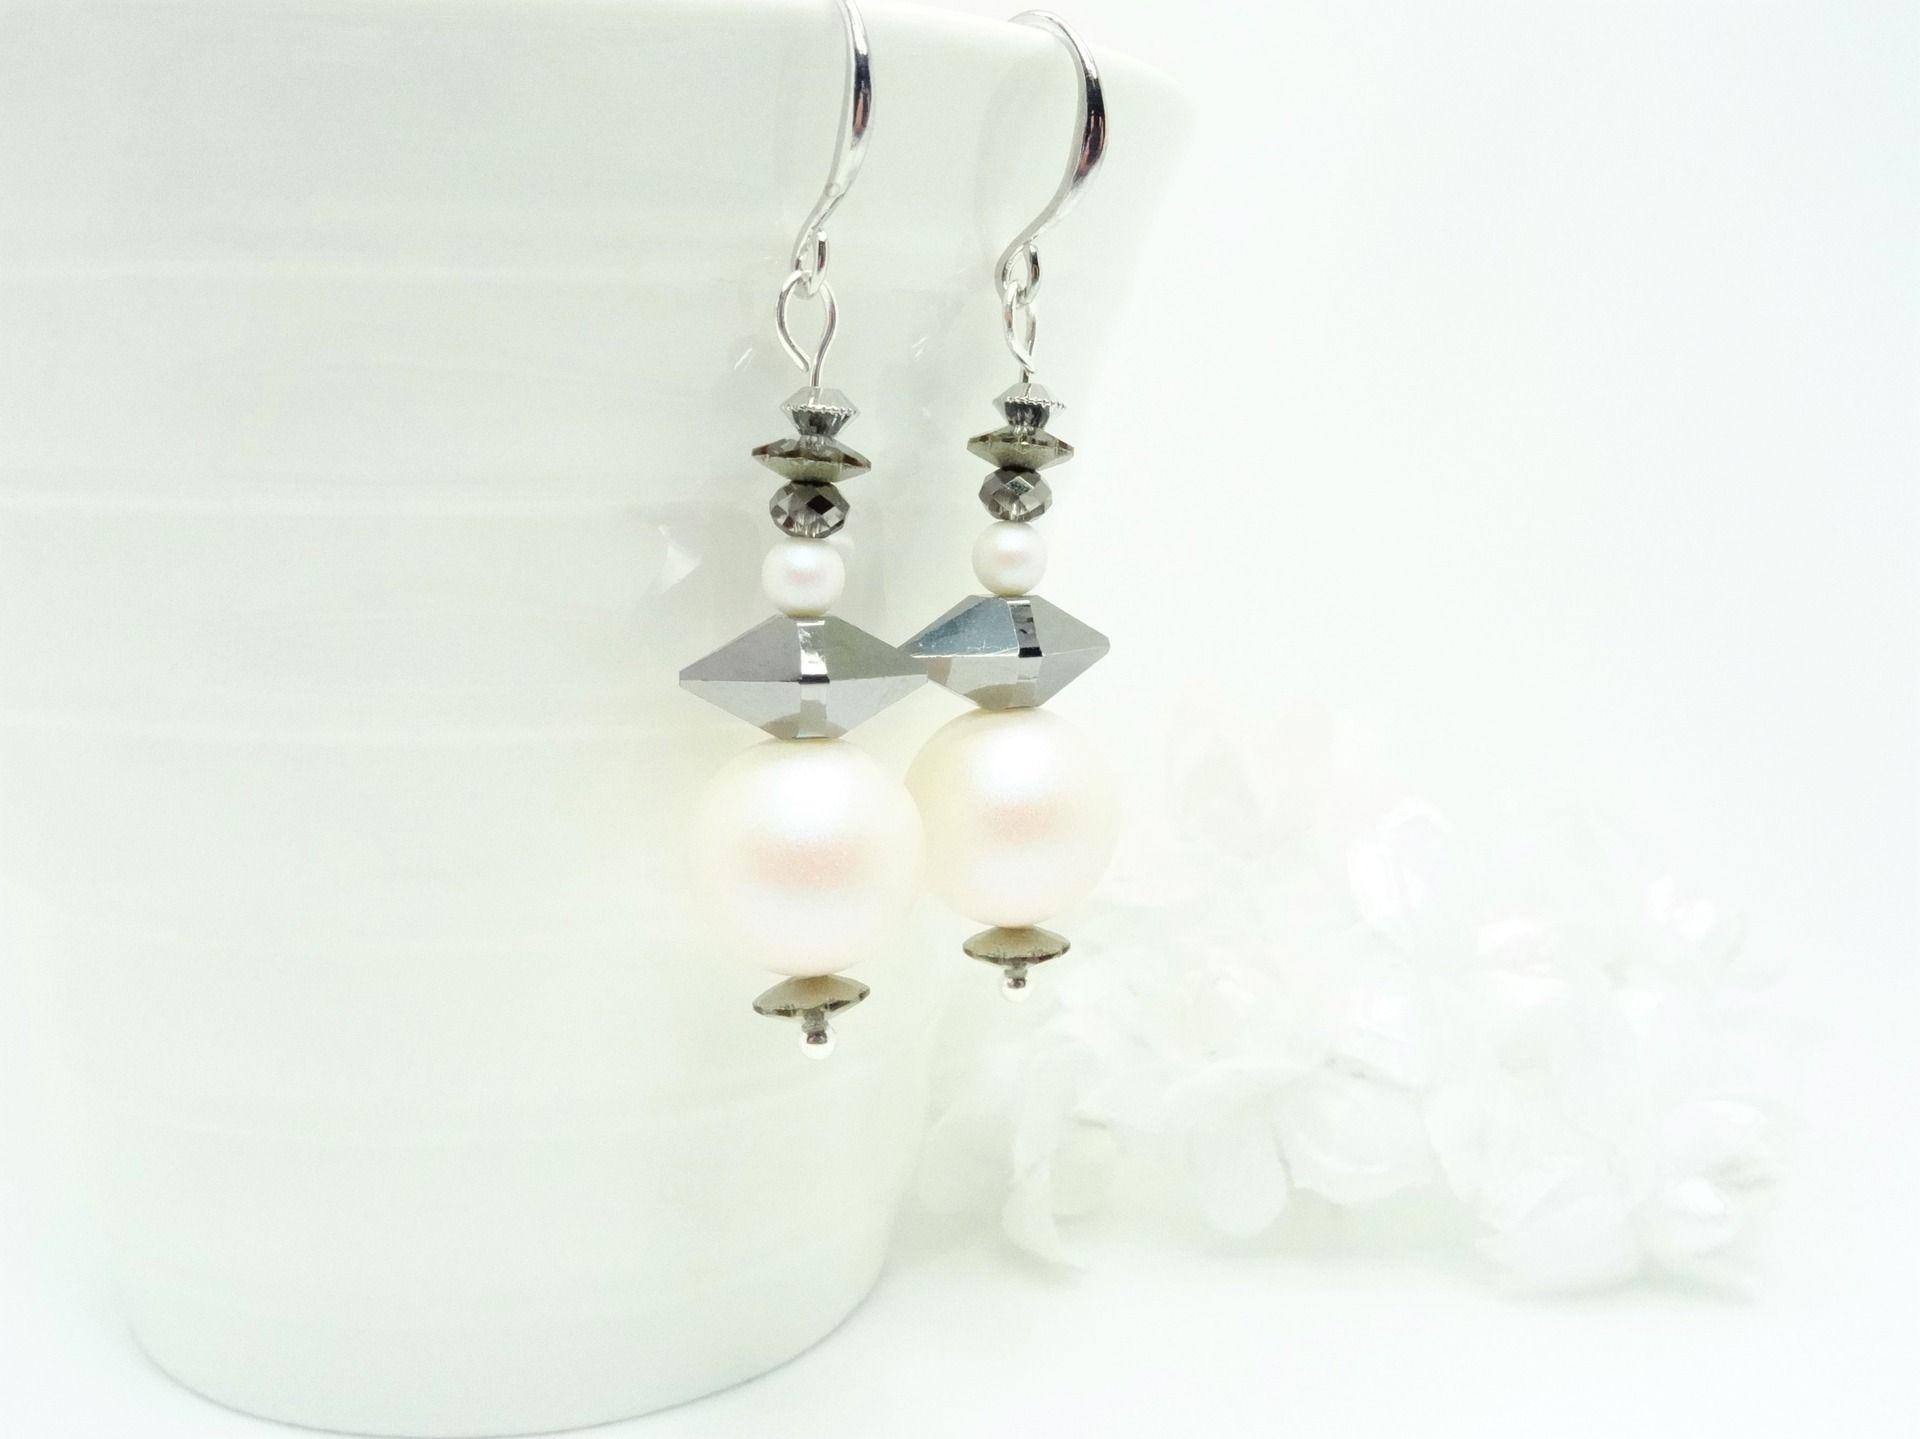 Boucle d'oreille double perle swarovski